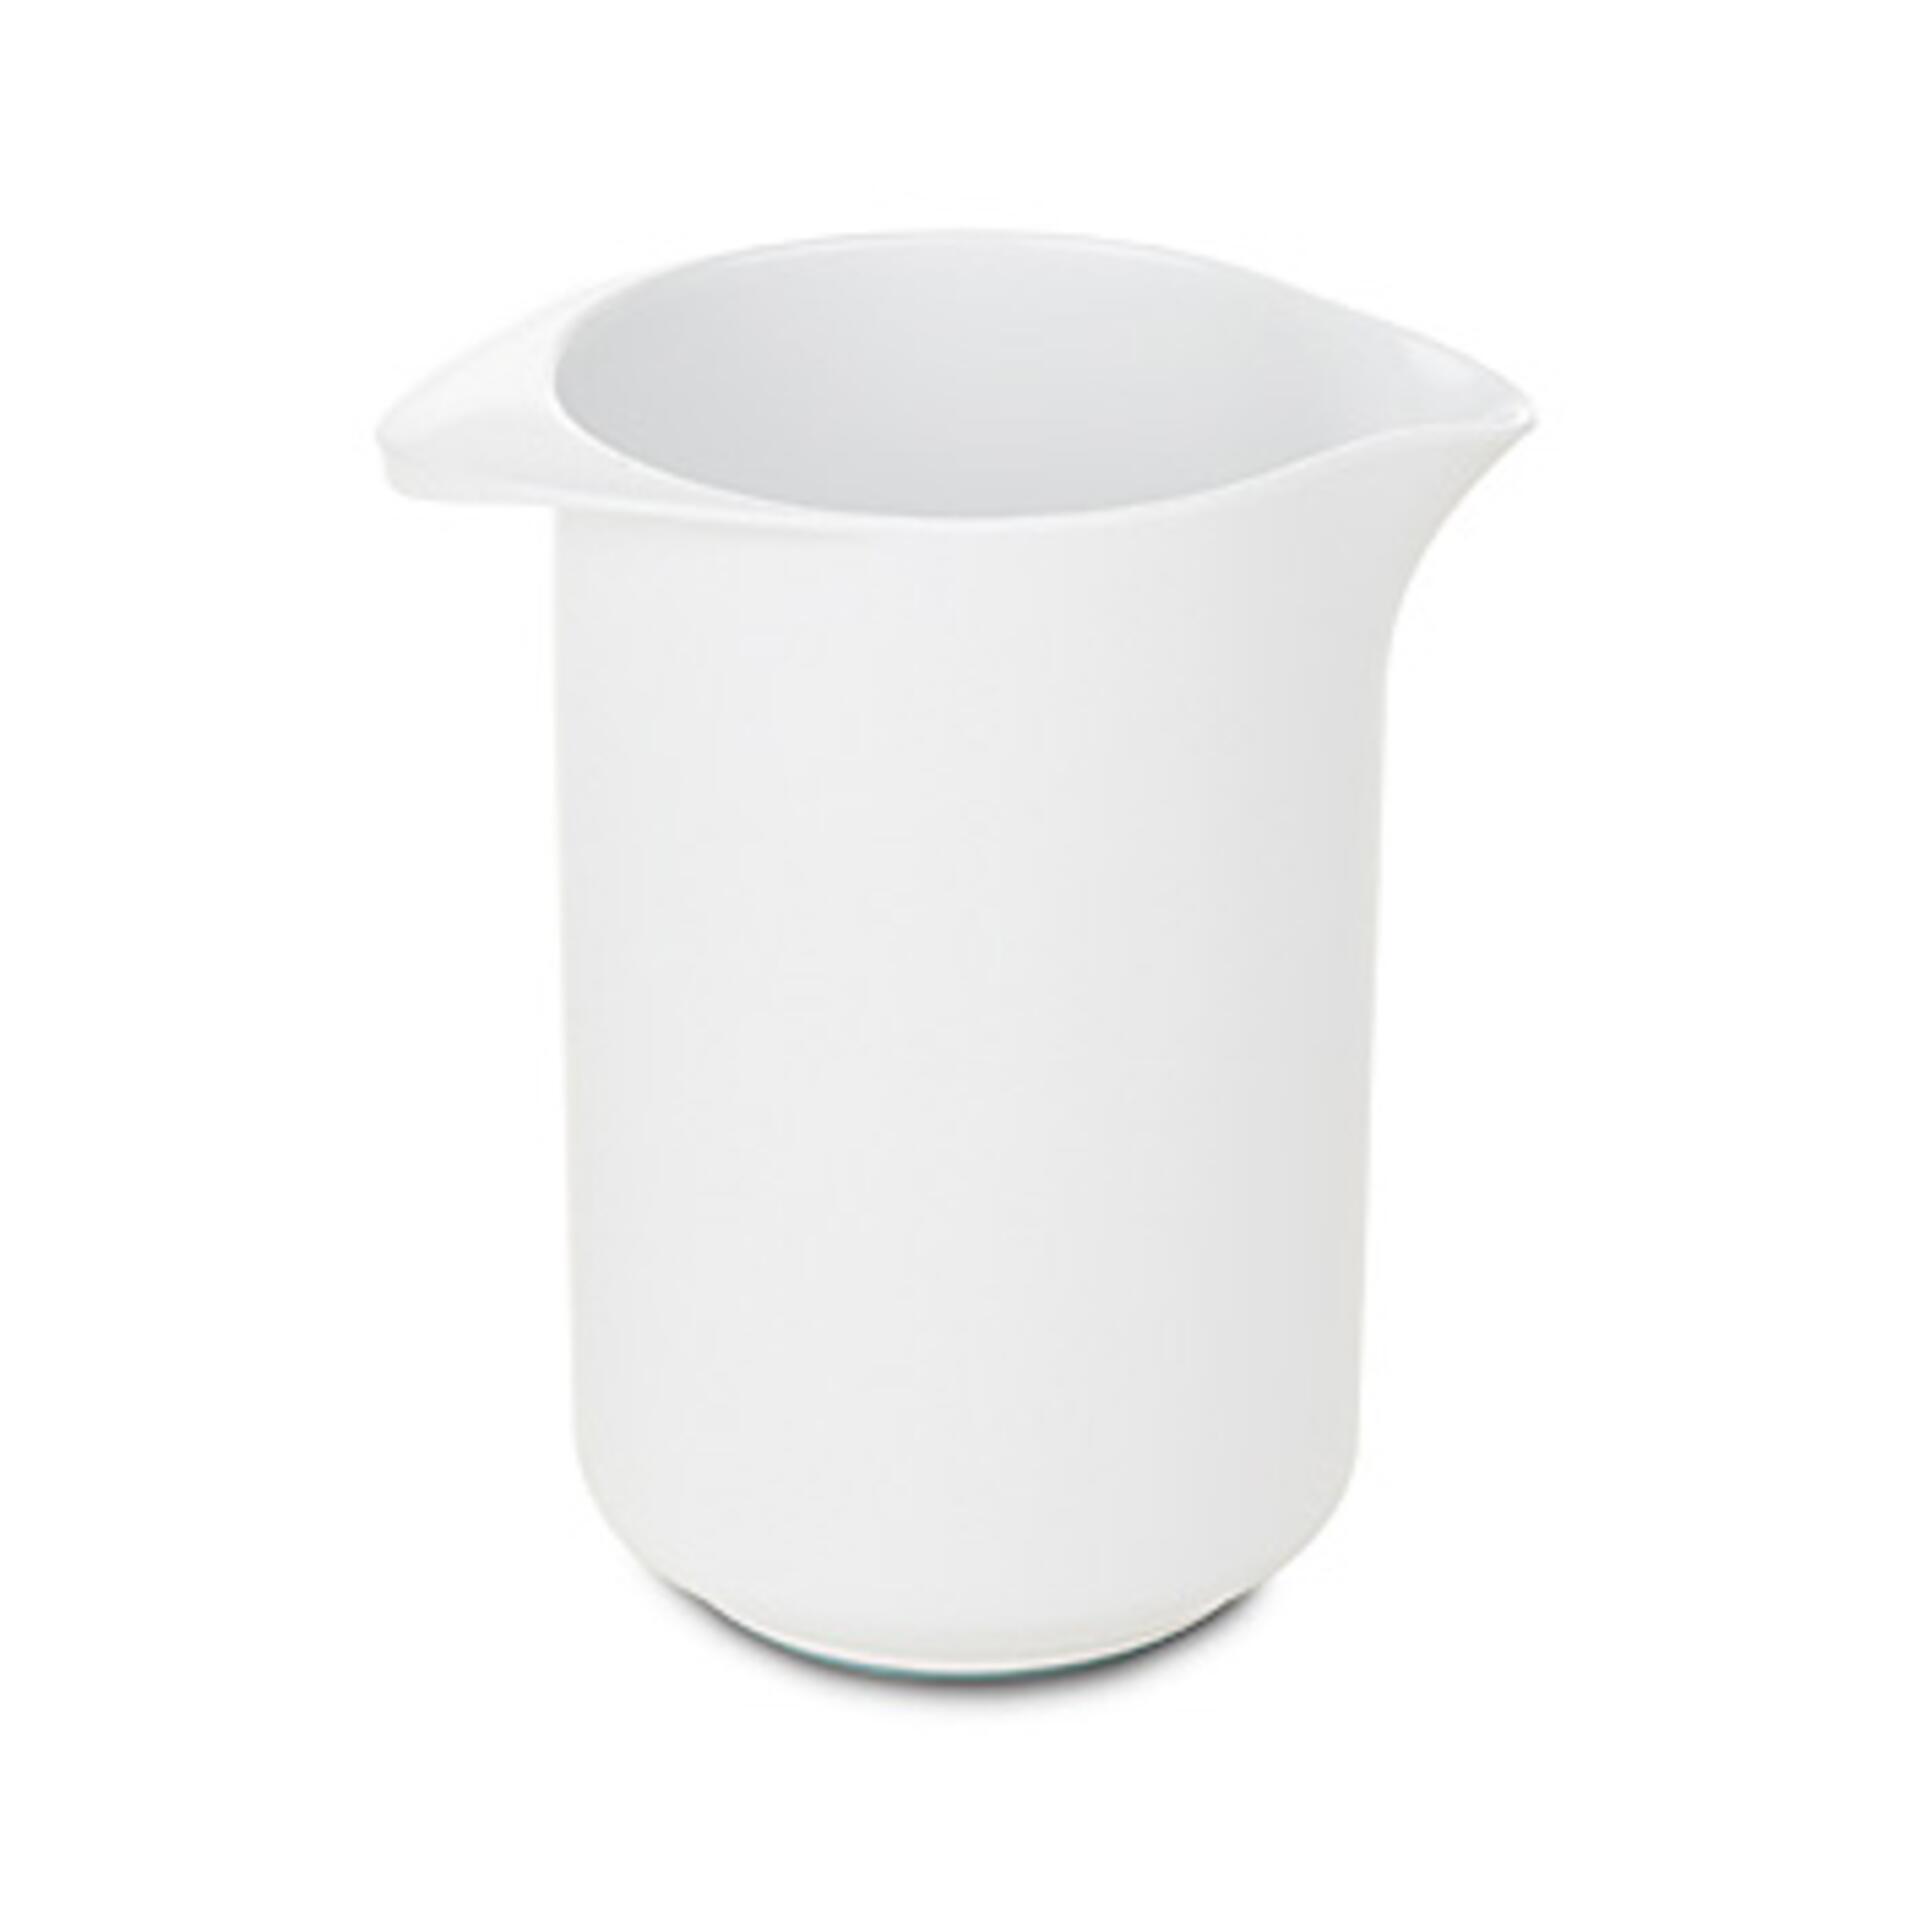 Rosti Mepal Margrethe Rührbecher 1,0 l Weiß